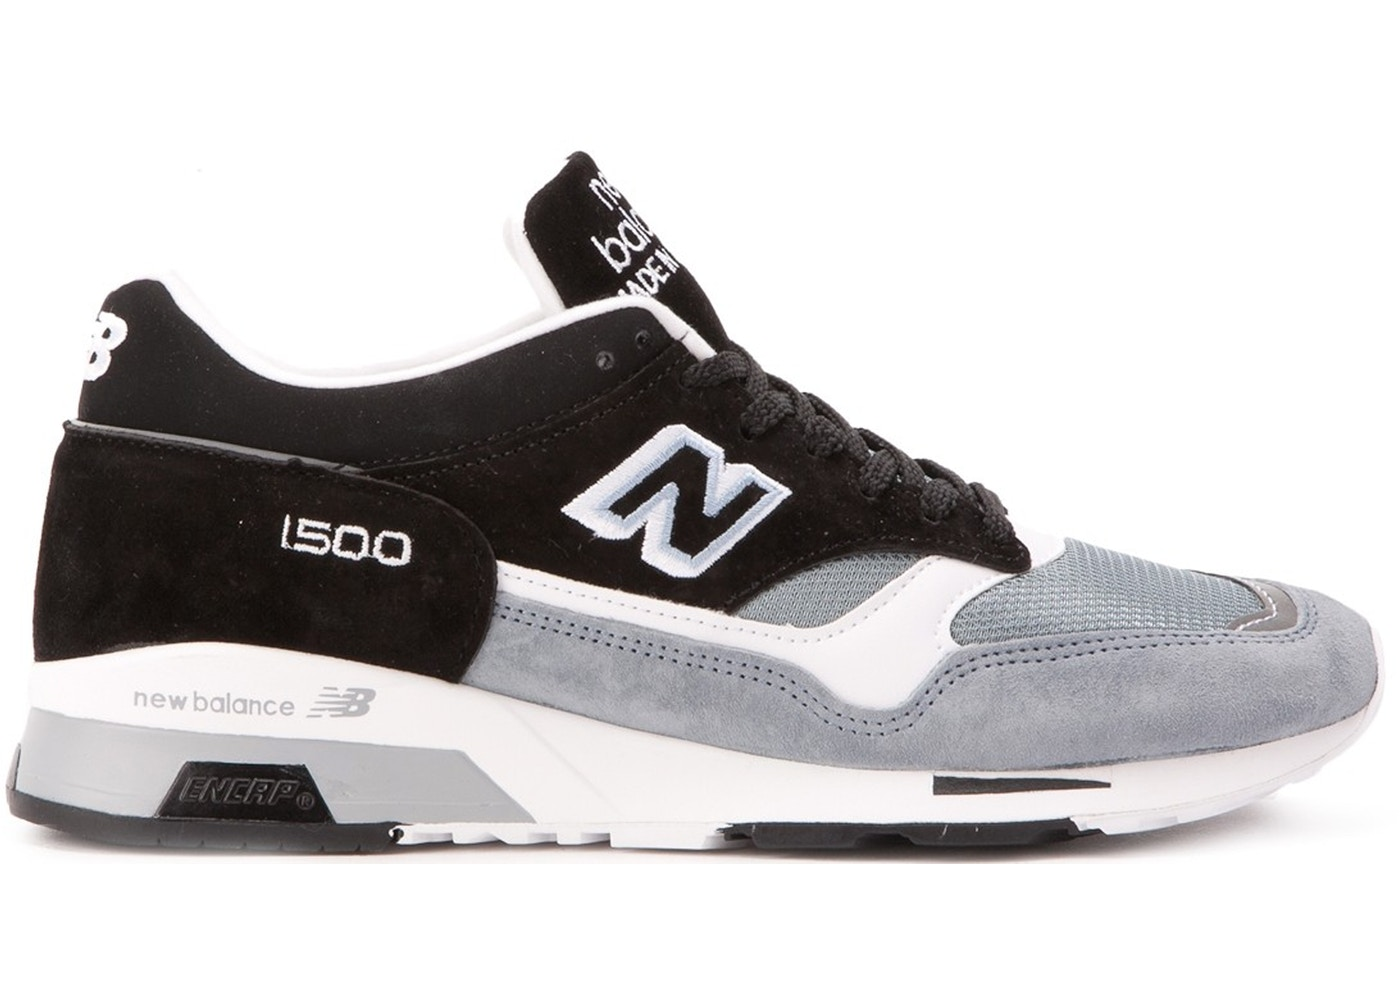 New Balance 1500 Black Dusty Blue